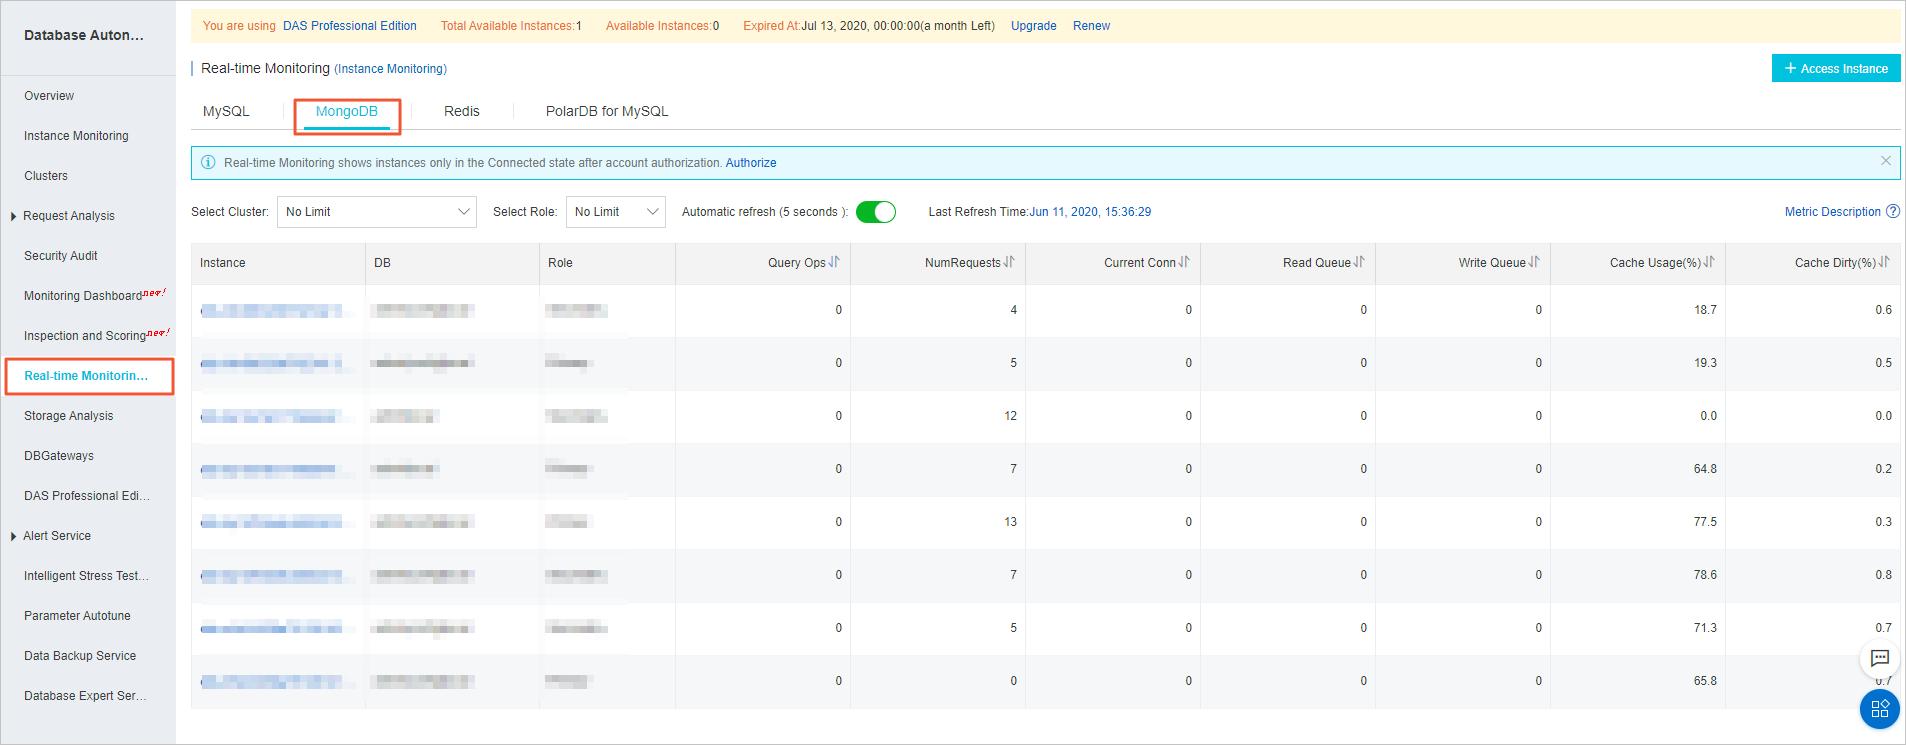 Real-time Monitoring-MongoDB-3